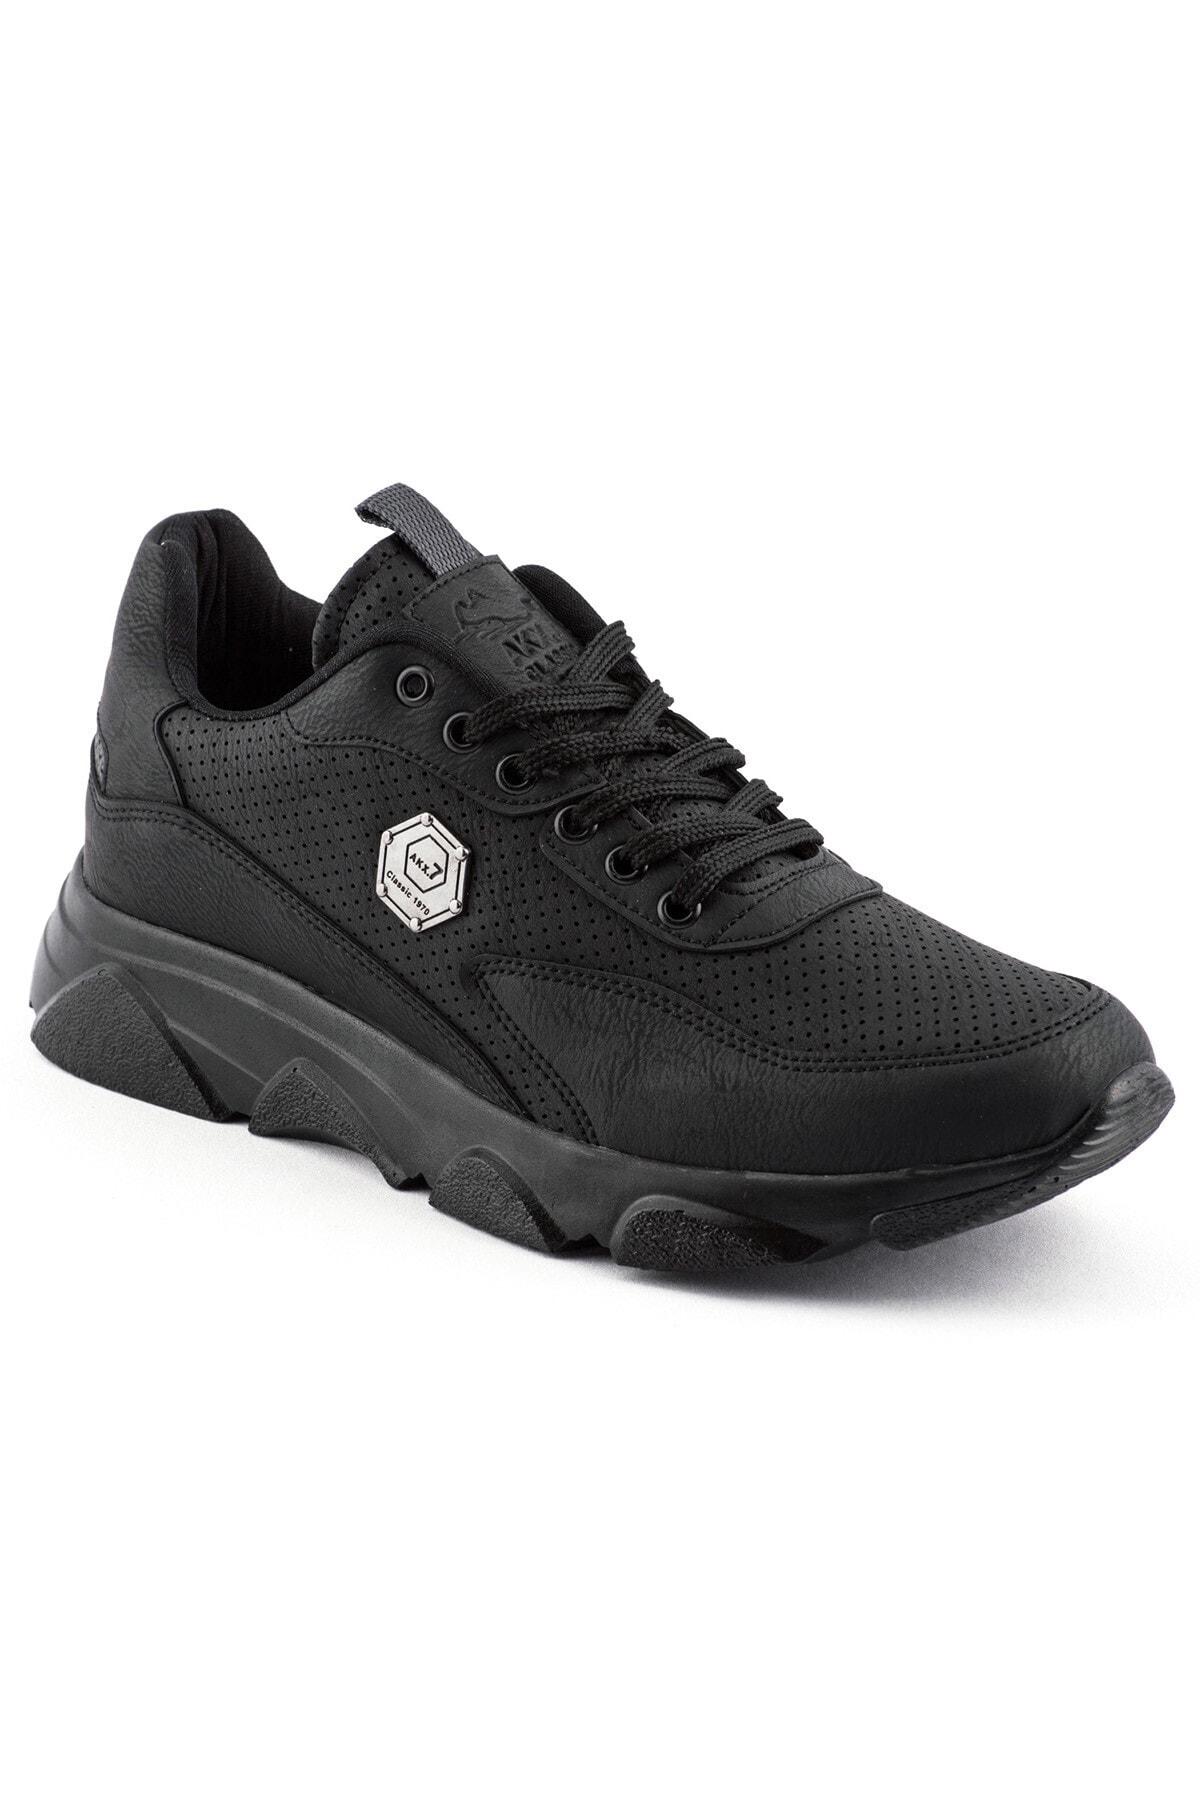 L.A Polo 135 Siyah Siyah Erkek Spor Ayakkabı 1